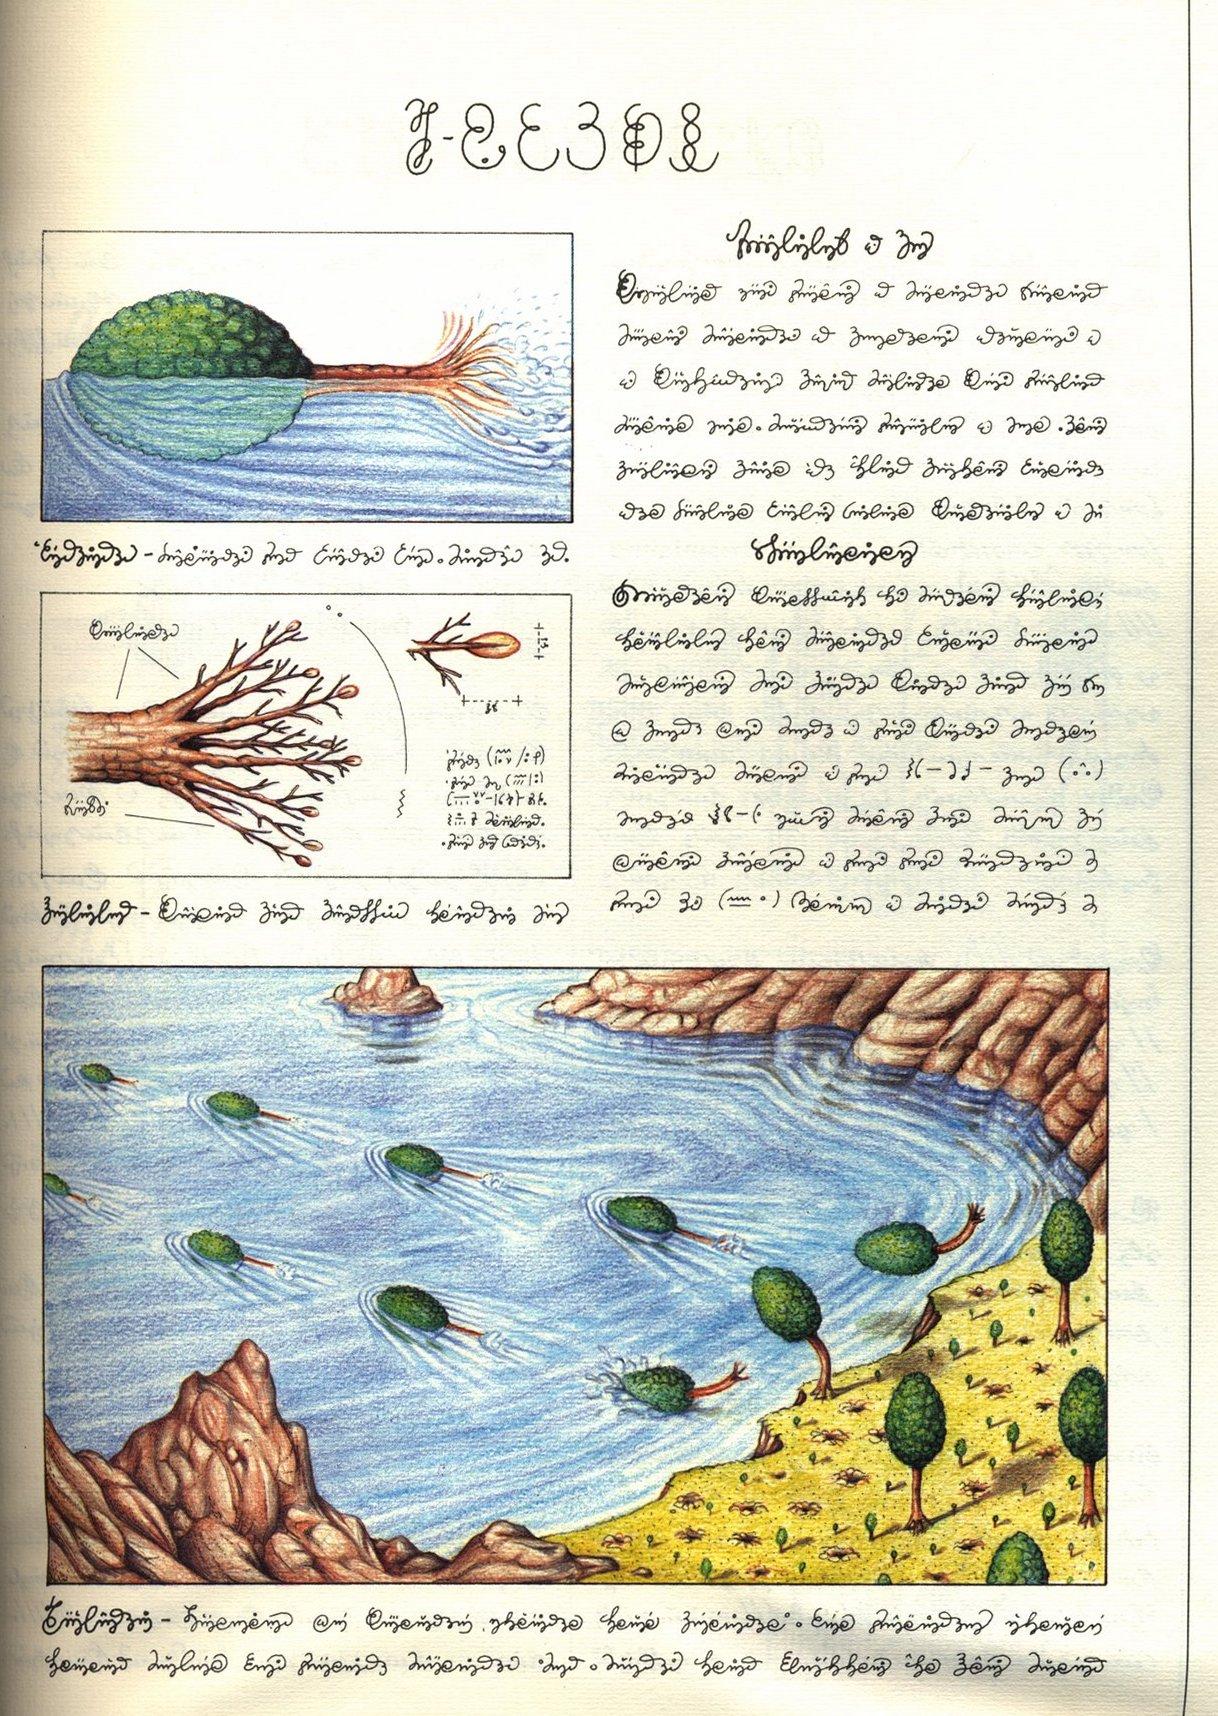 codex-seraphinianus-1983-031.jpg